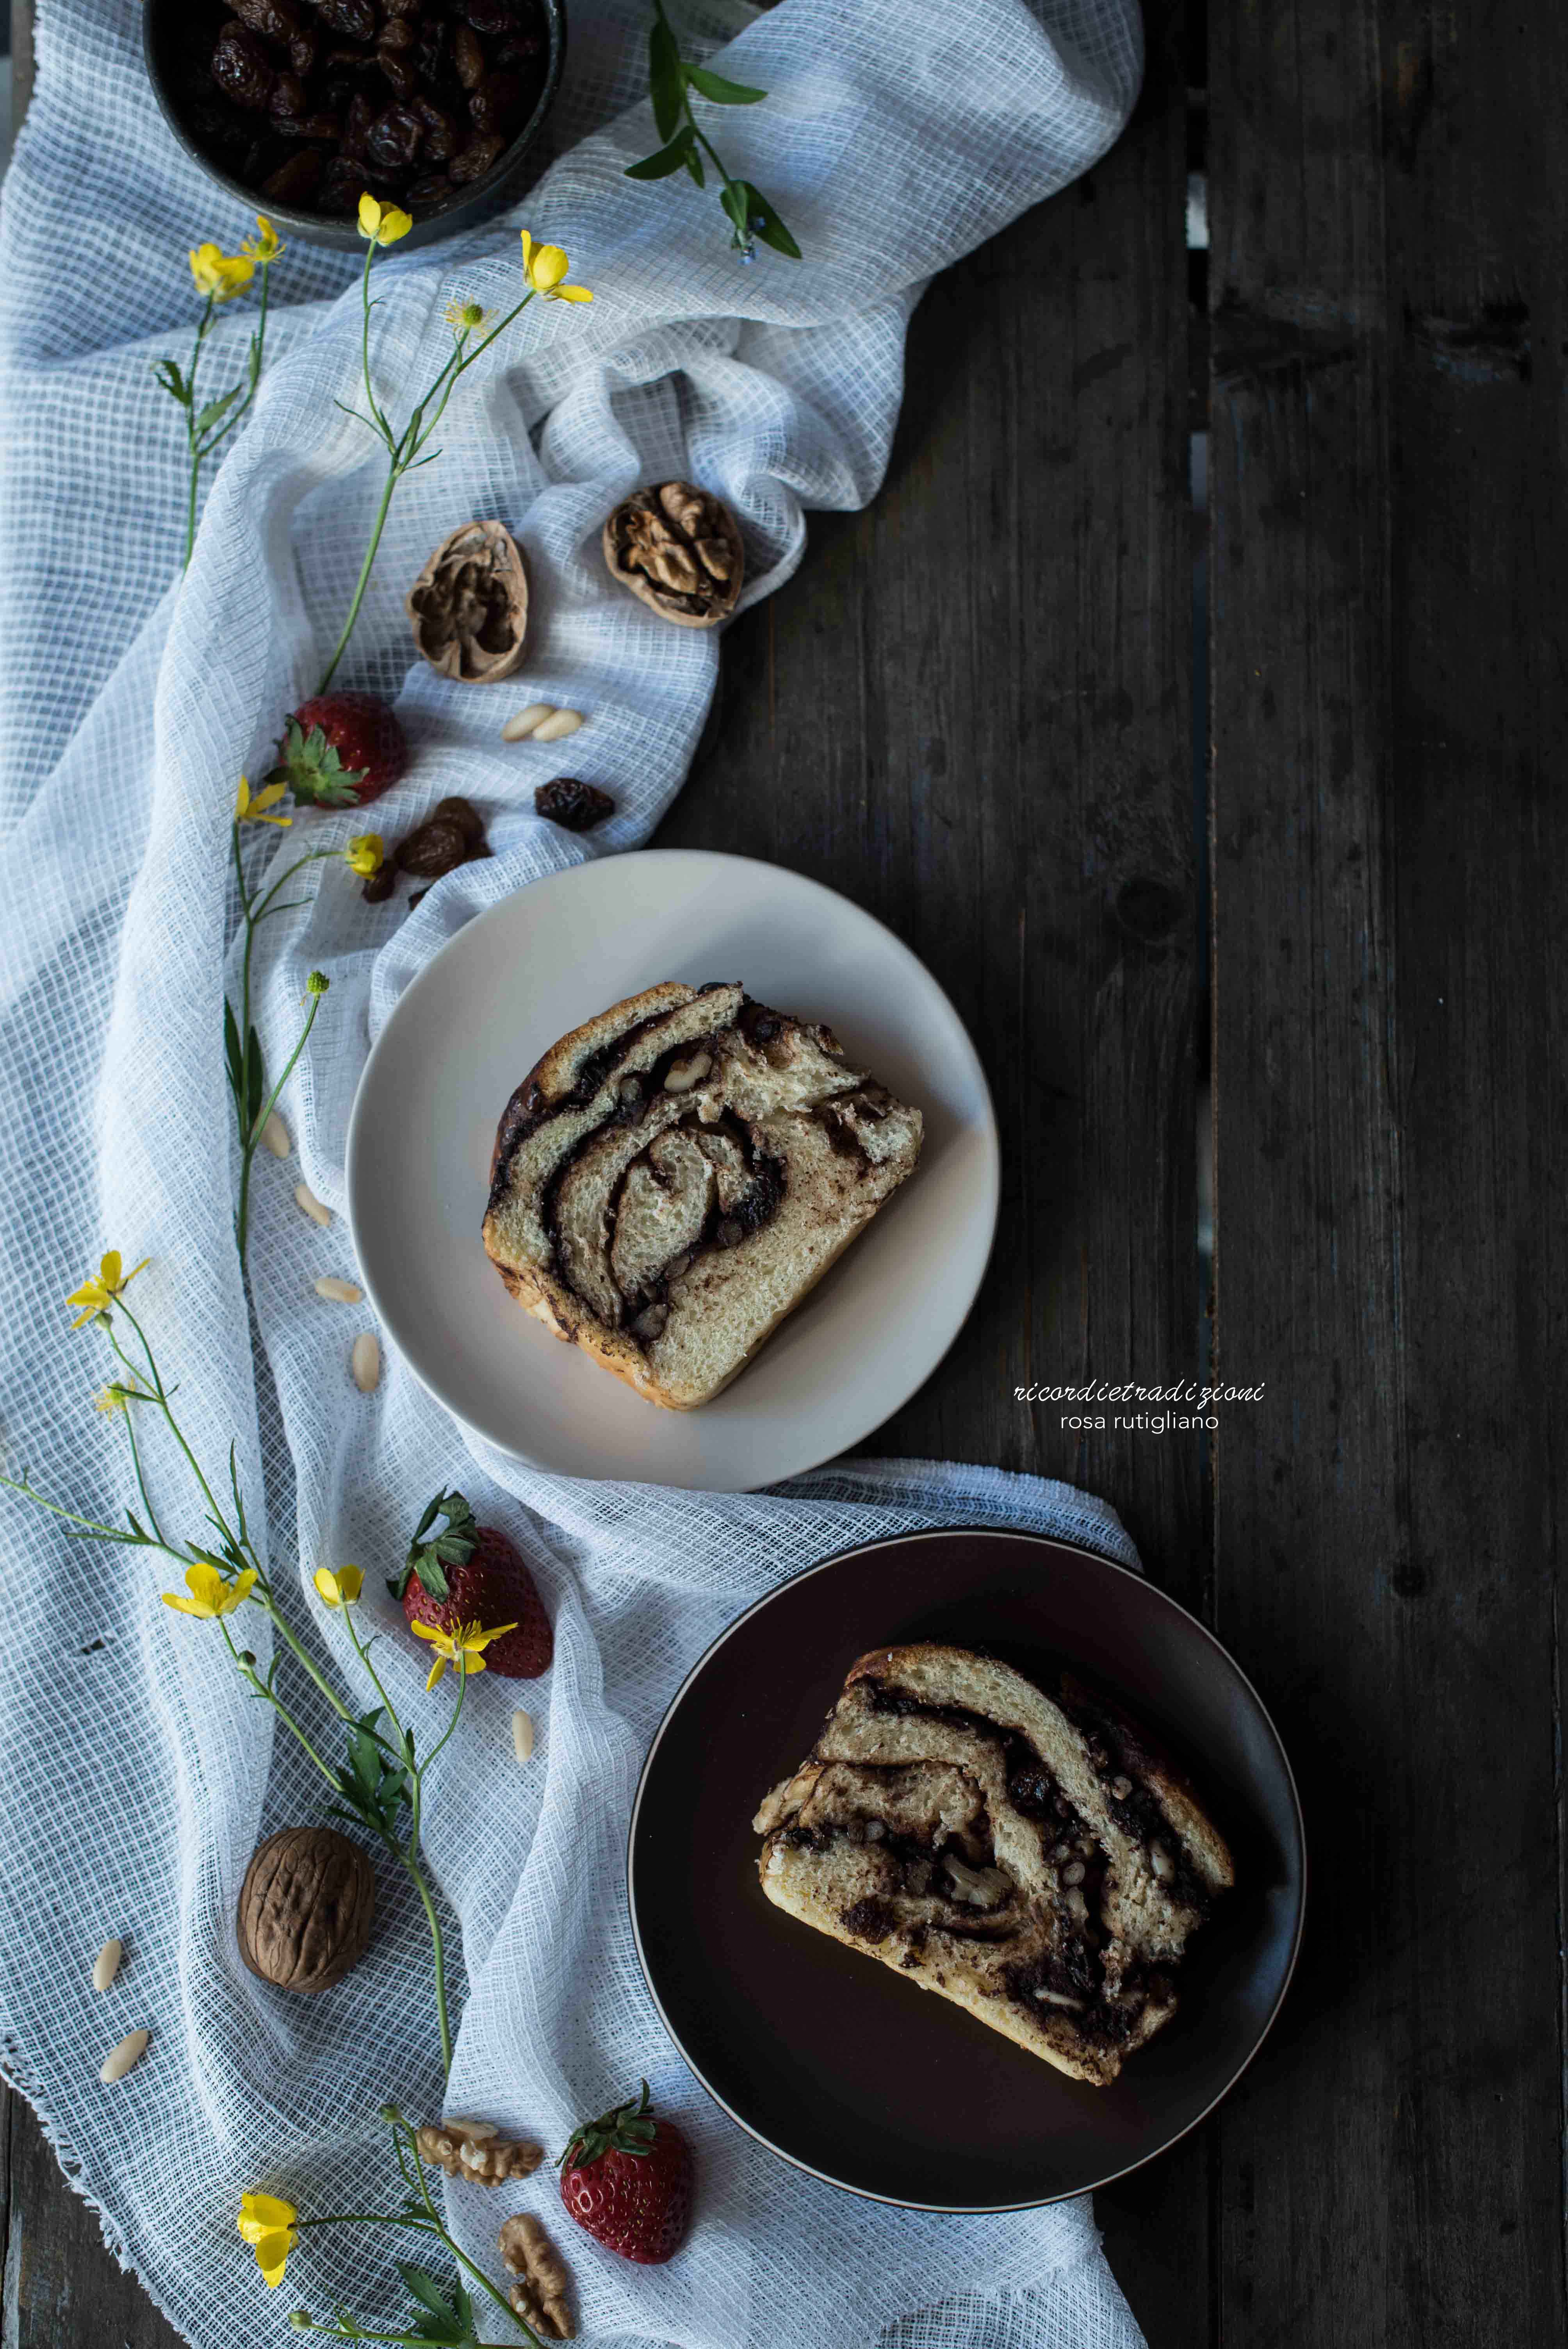 Babka al cioccolato con pinoli noci e uvetta 4